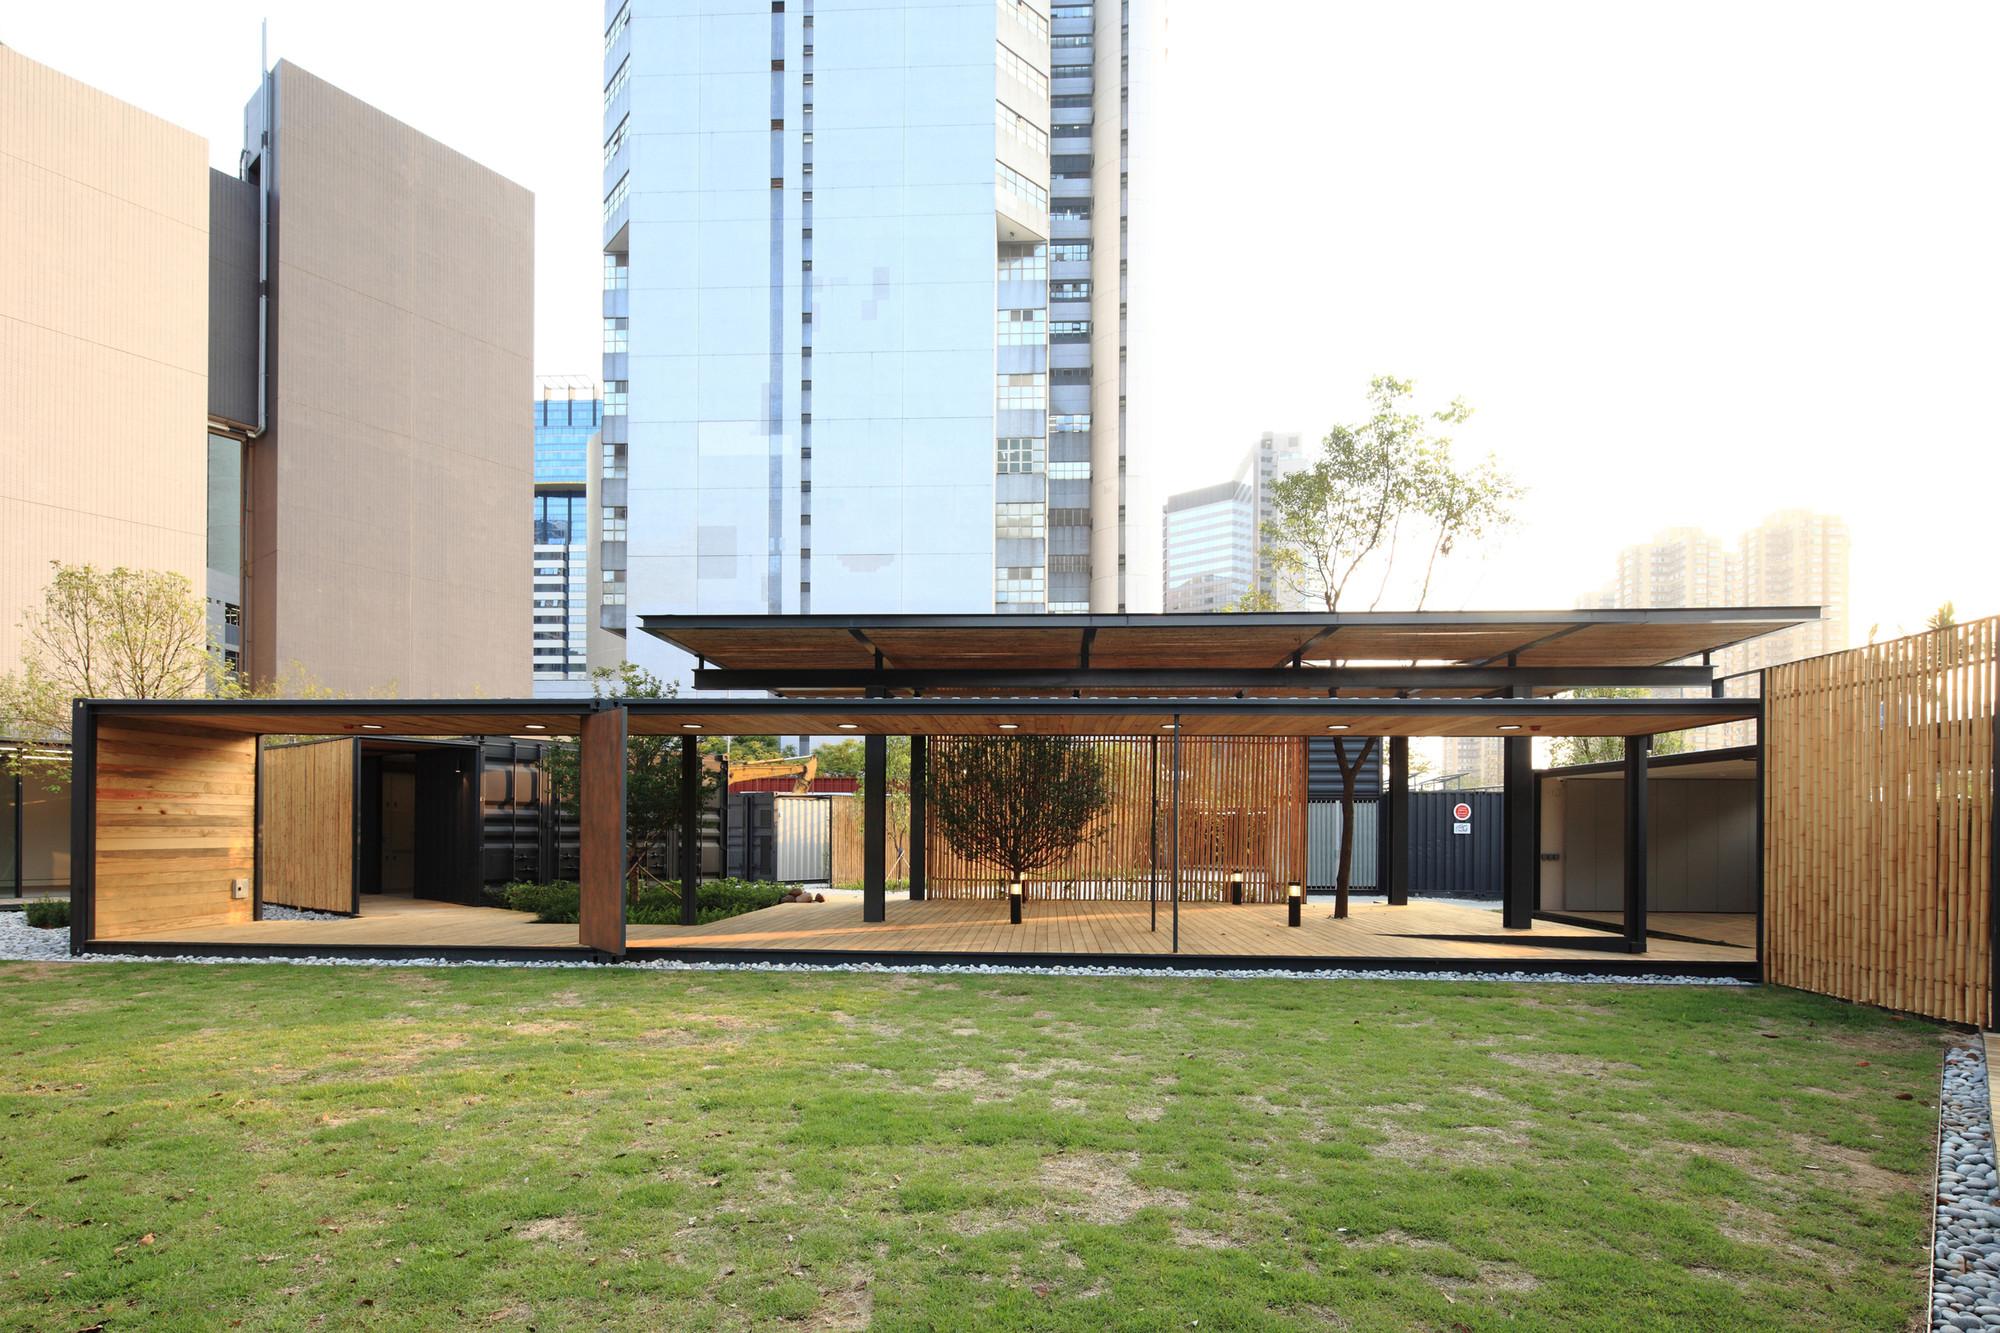 Gallery of ommunity Green Station / Hong Kong rchitectural ... - ^